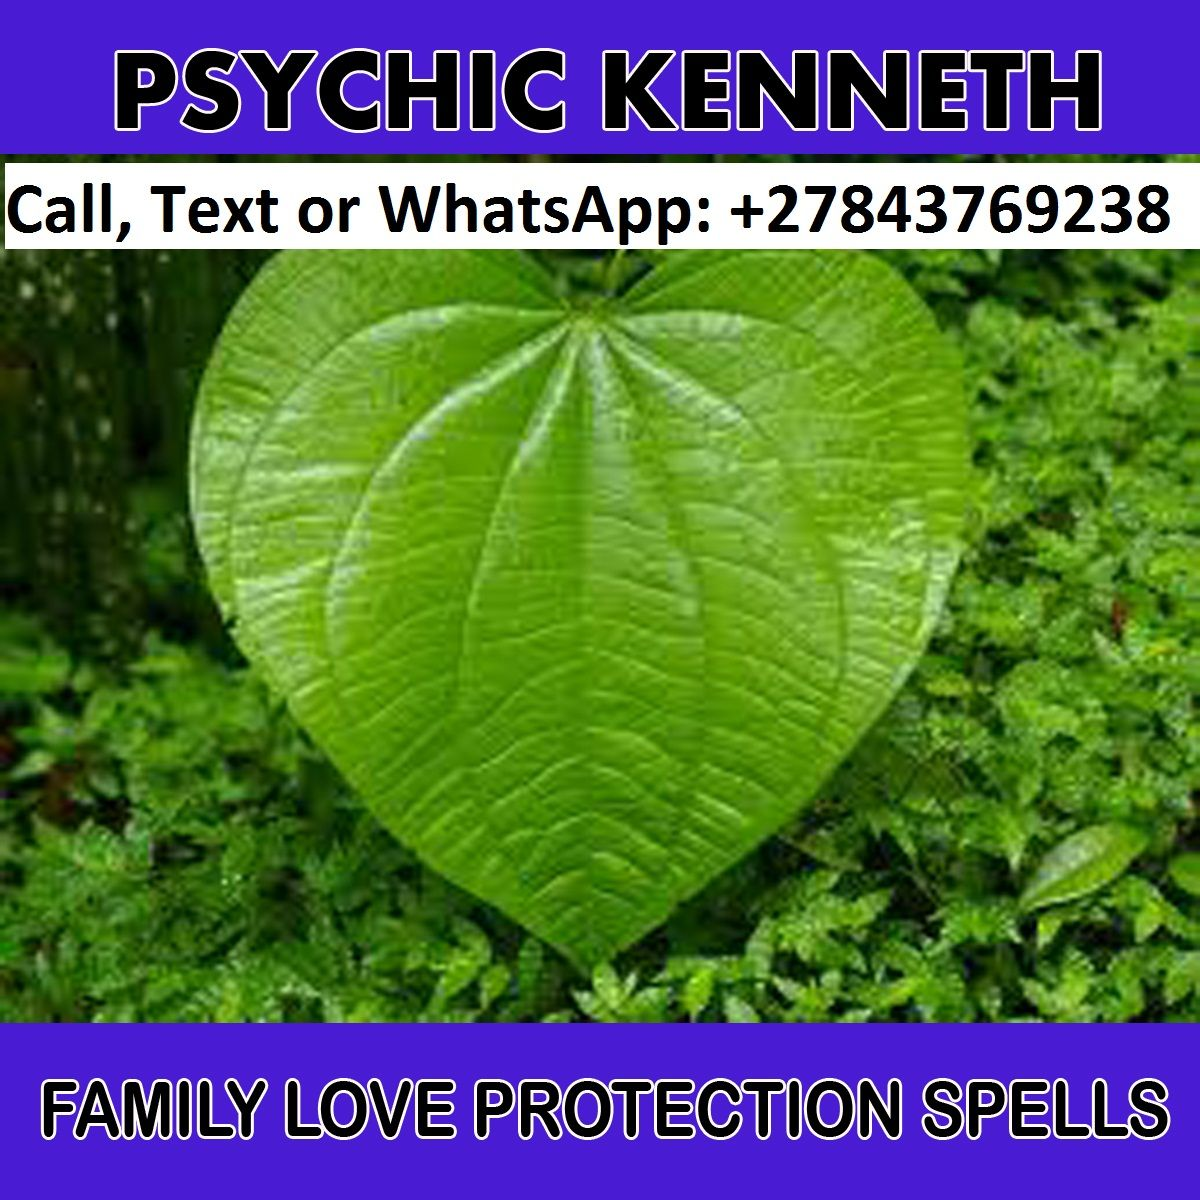 Simple Love Spell, Call / WhatsApp: +27843769238 Http